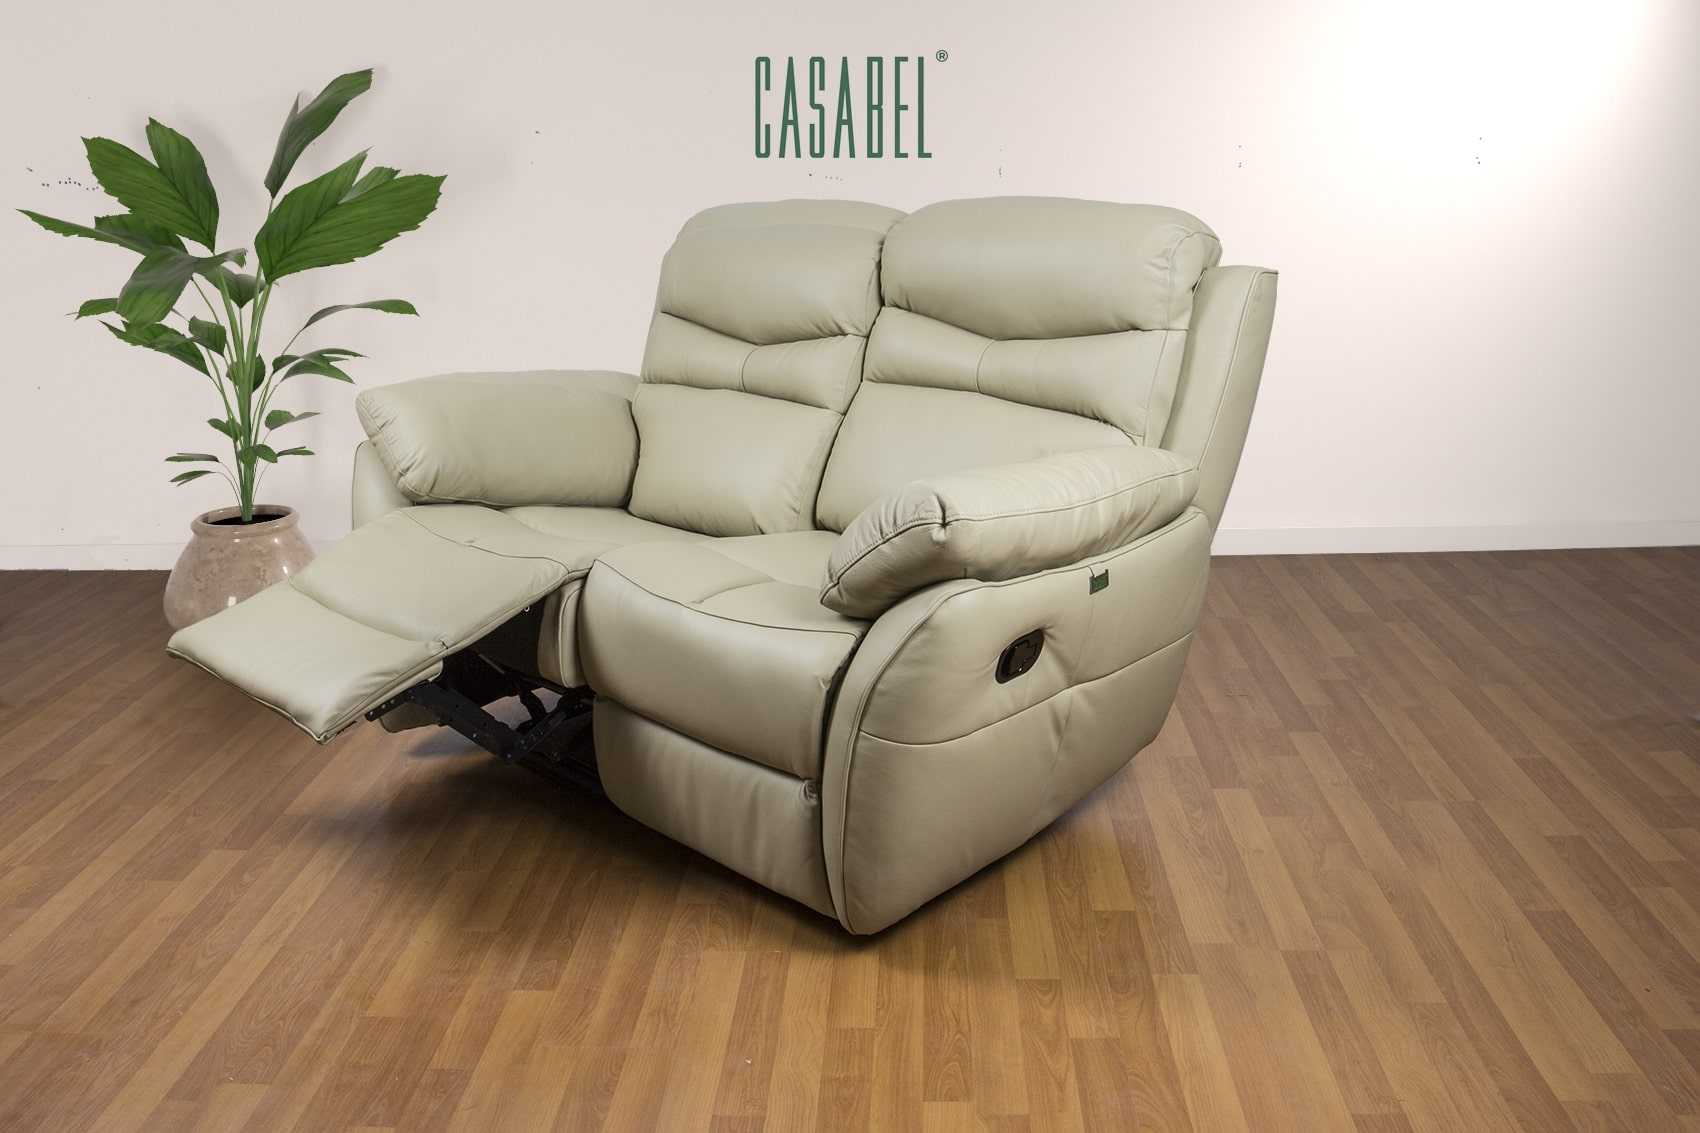 Terrific Casabel Alma Sofa Recliner 2 Kursi Beige Theyellowbook Wood Chair Design Ideas Theyellowbookinfo